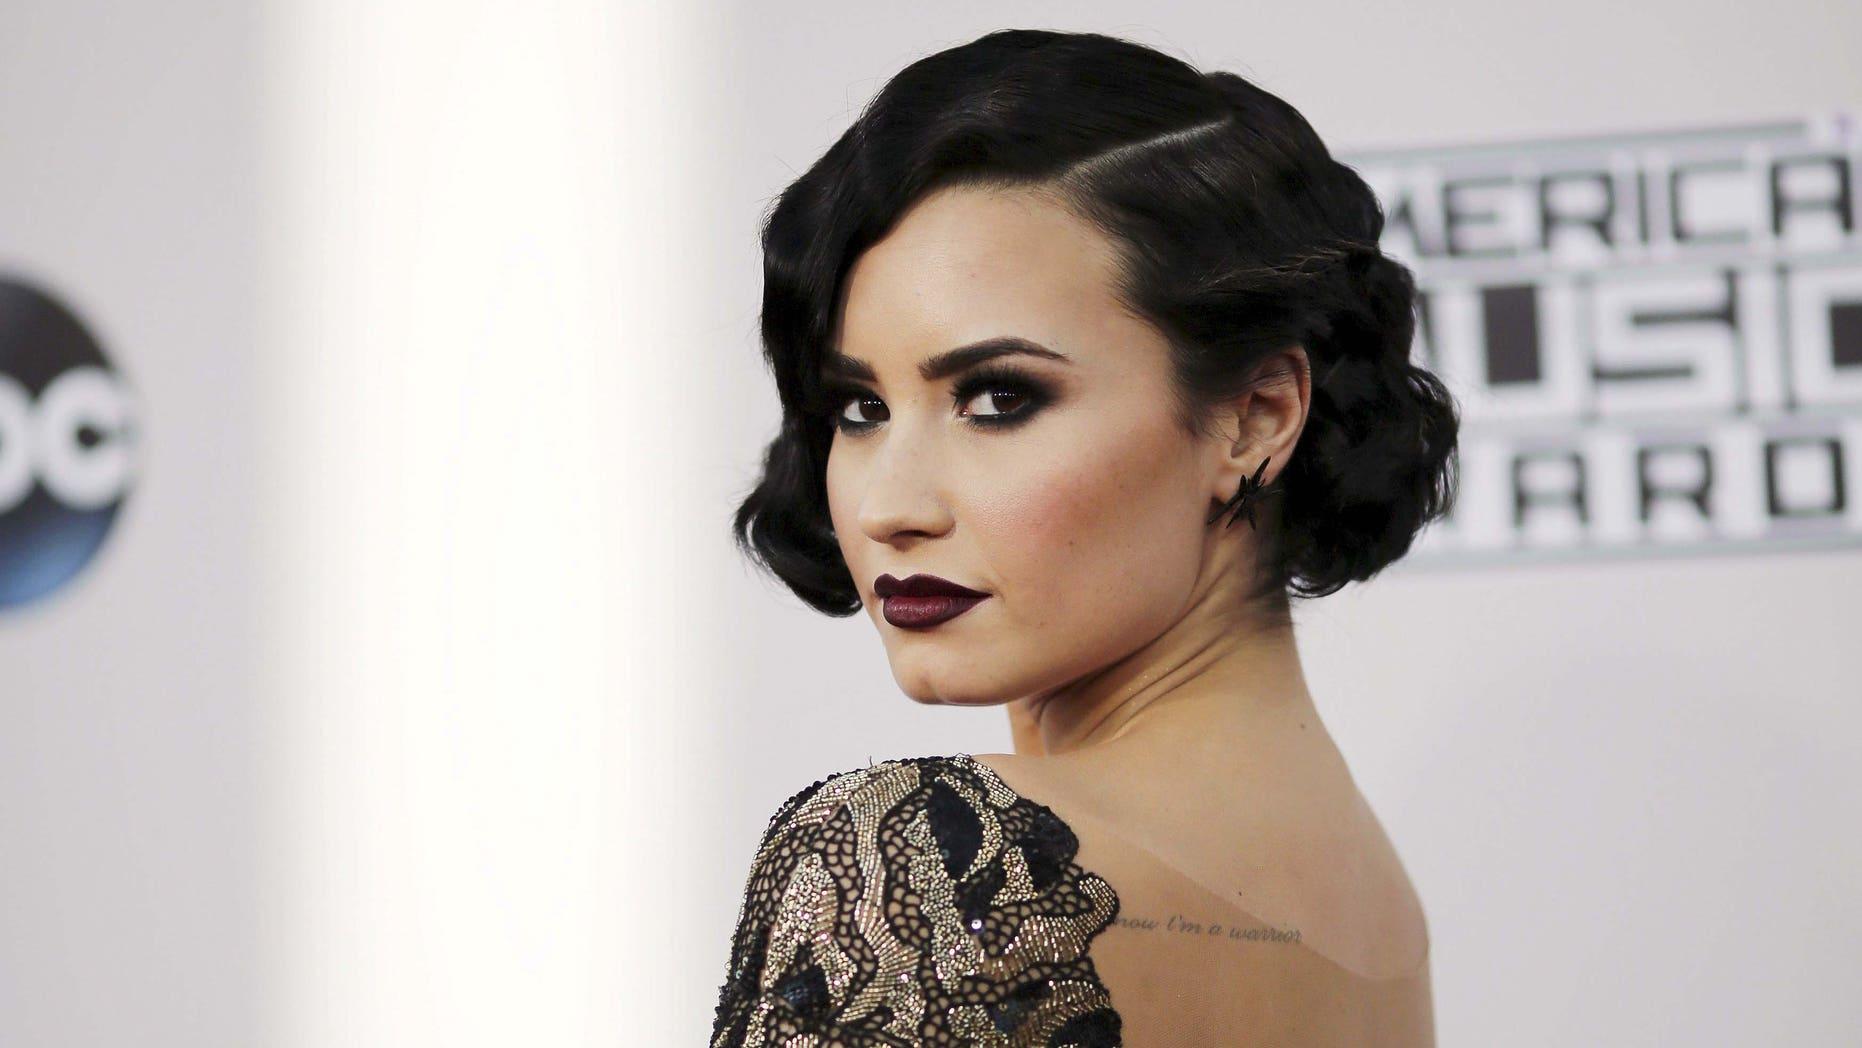 November 22, 2015. Singer Demi Lovato arrives at the 2015 American Music Awards in Los Angeles, California.